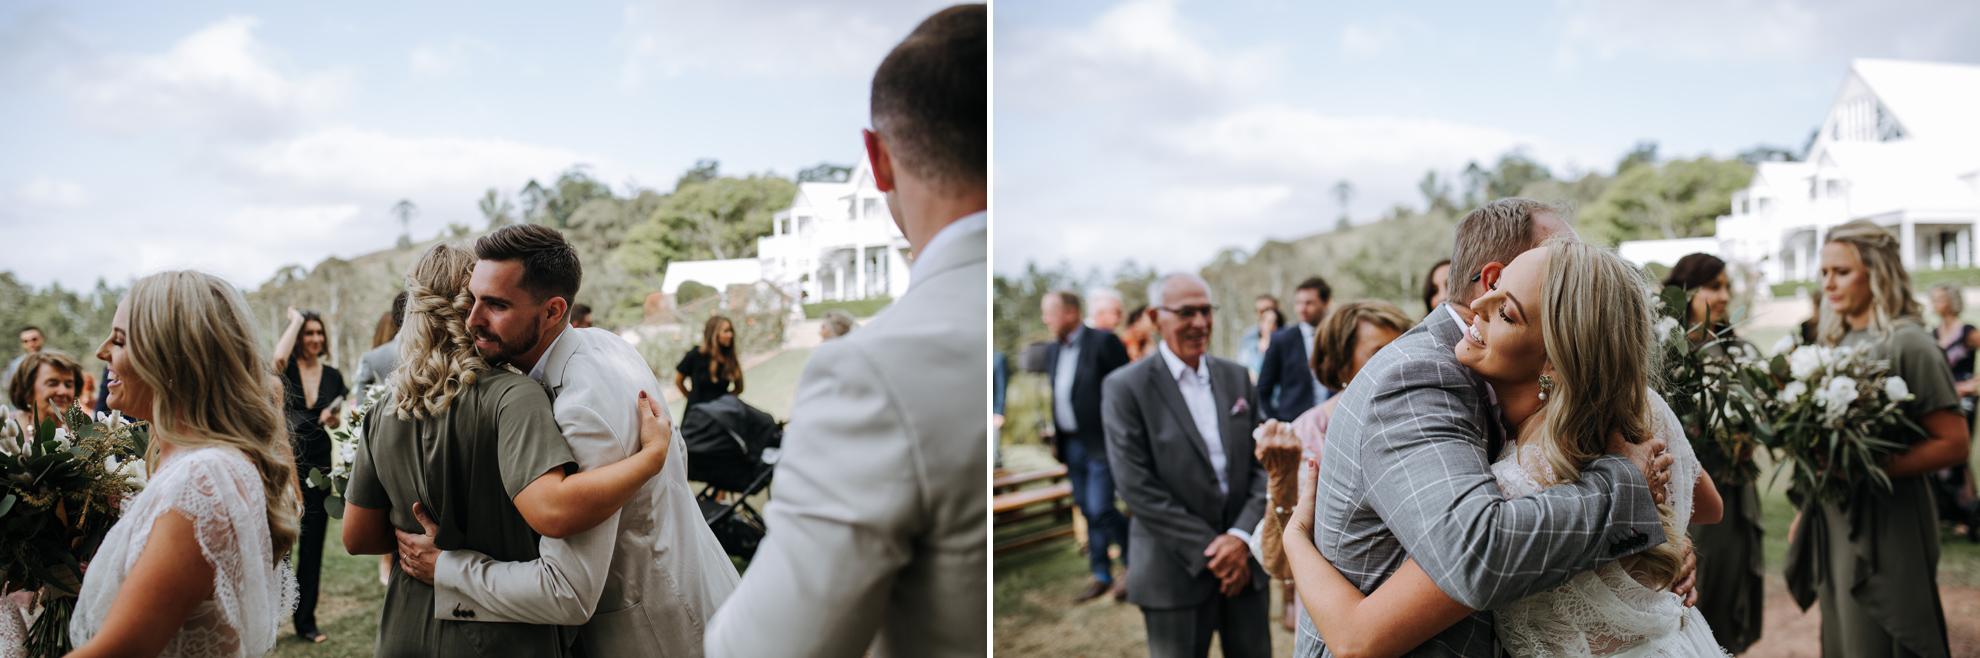 051-Kirby_Lewis_Maleny_Manor_Wedding.jpg